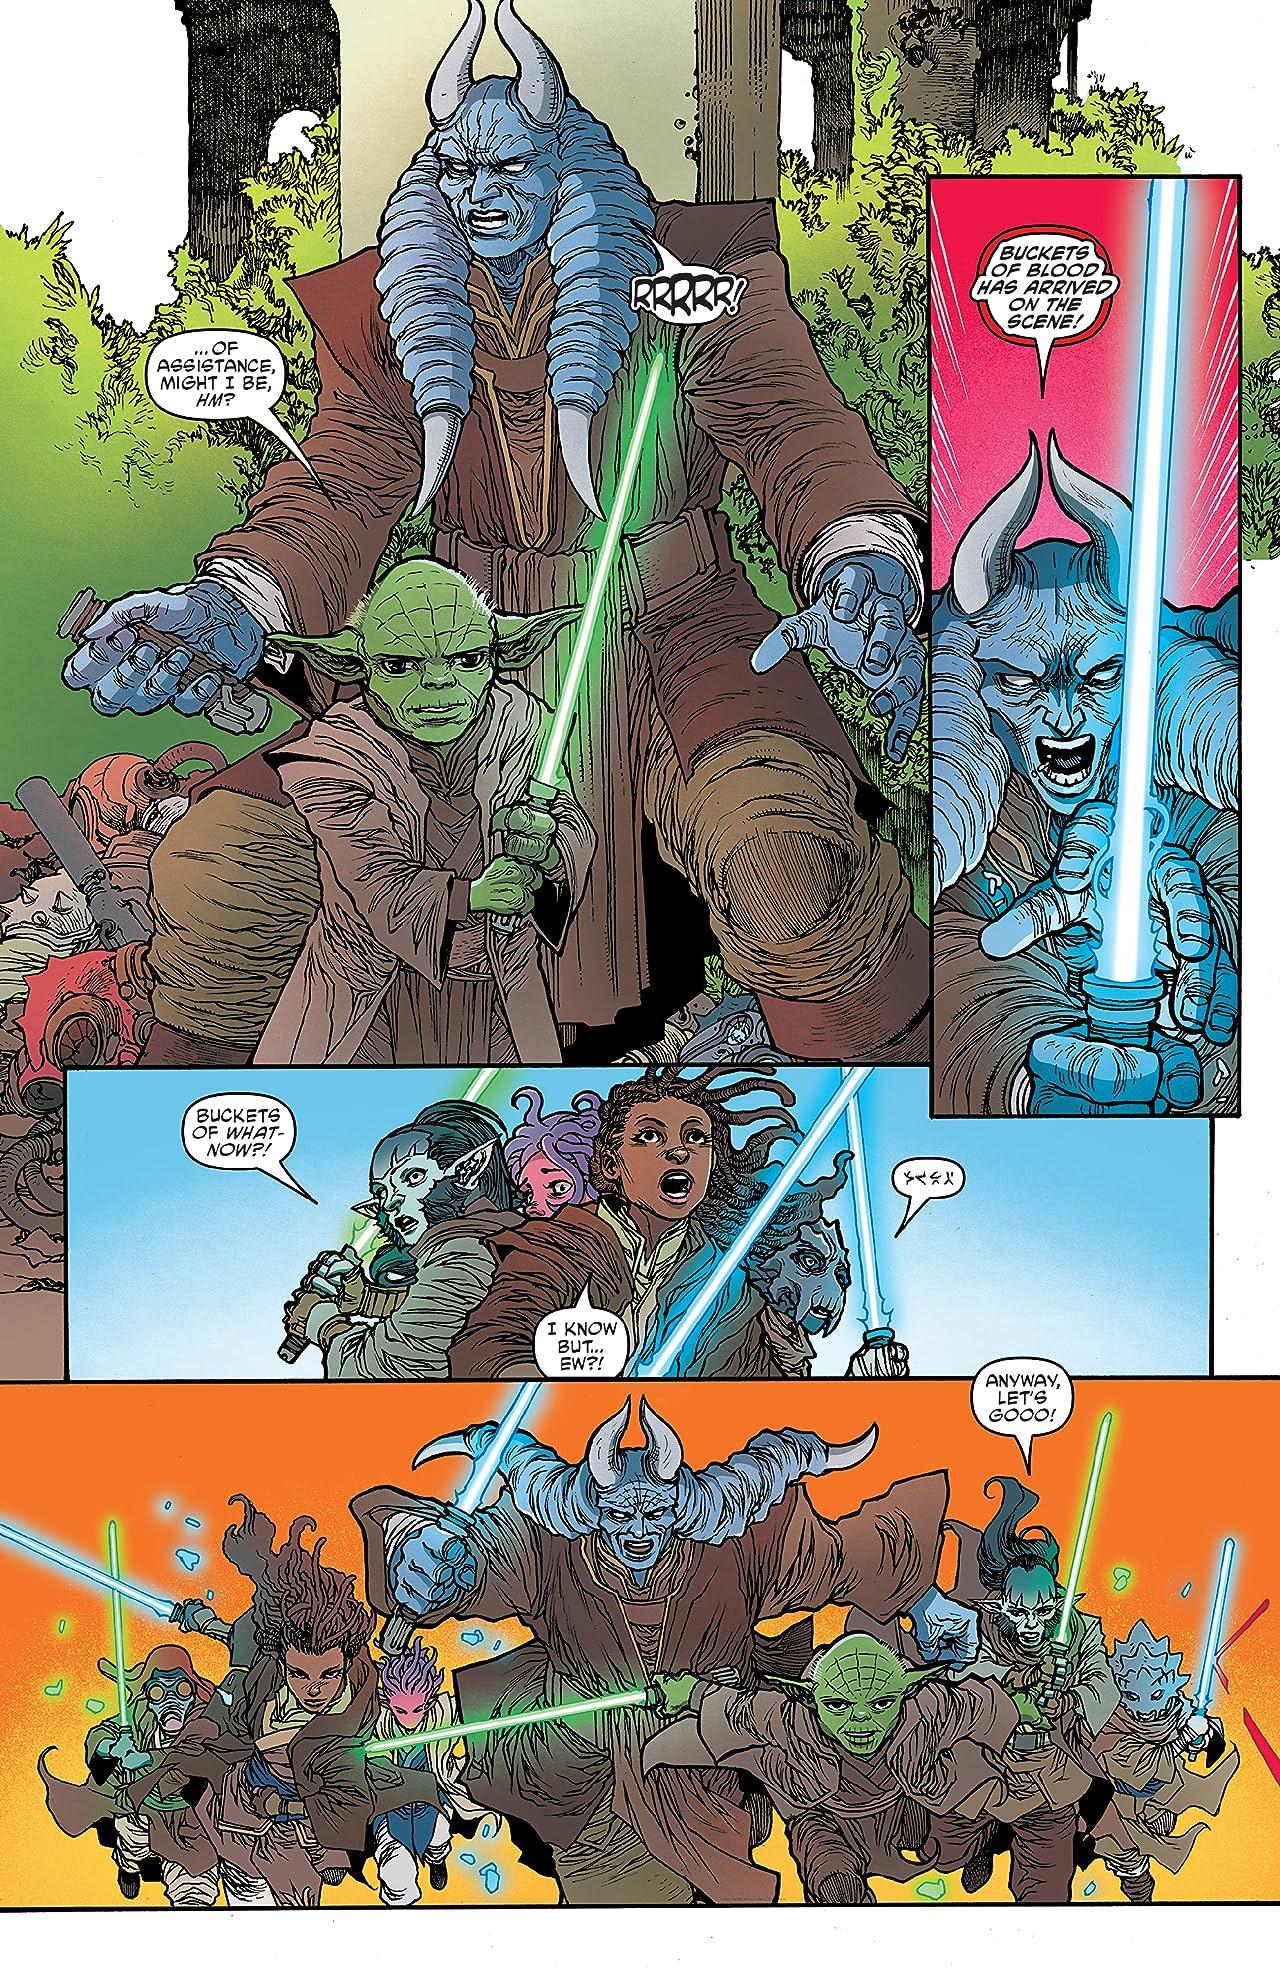 Star Wars: The High Republic Adventures #2